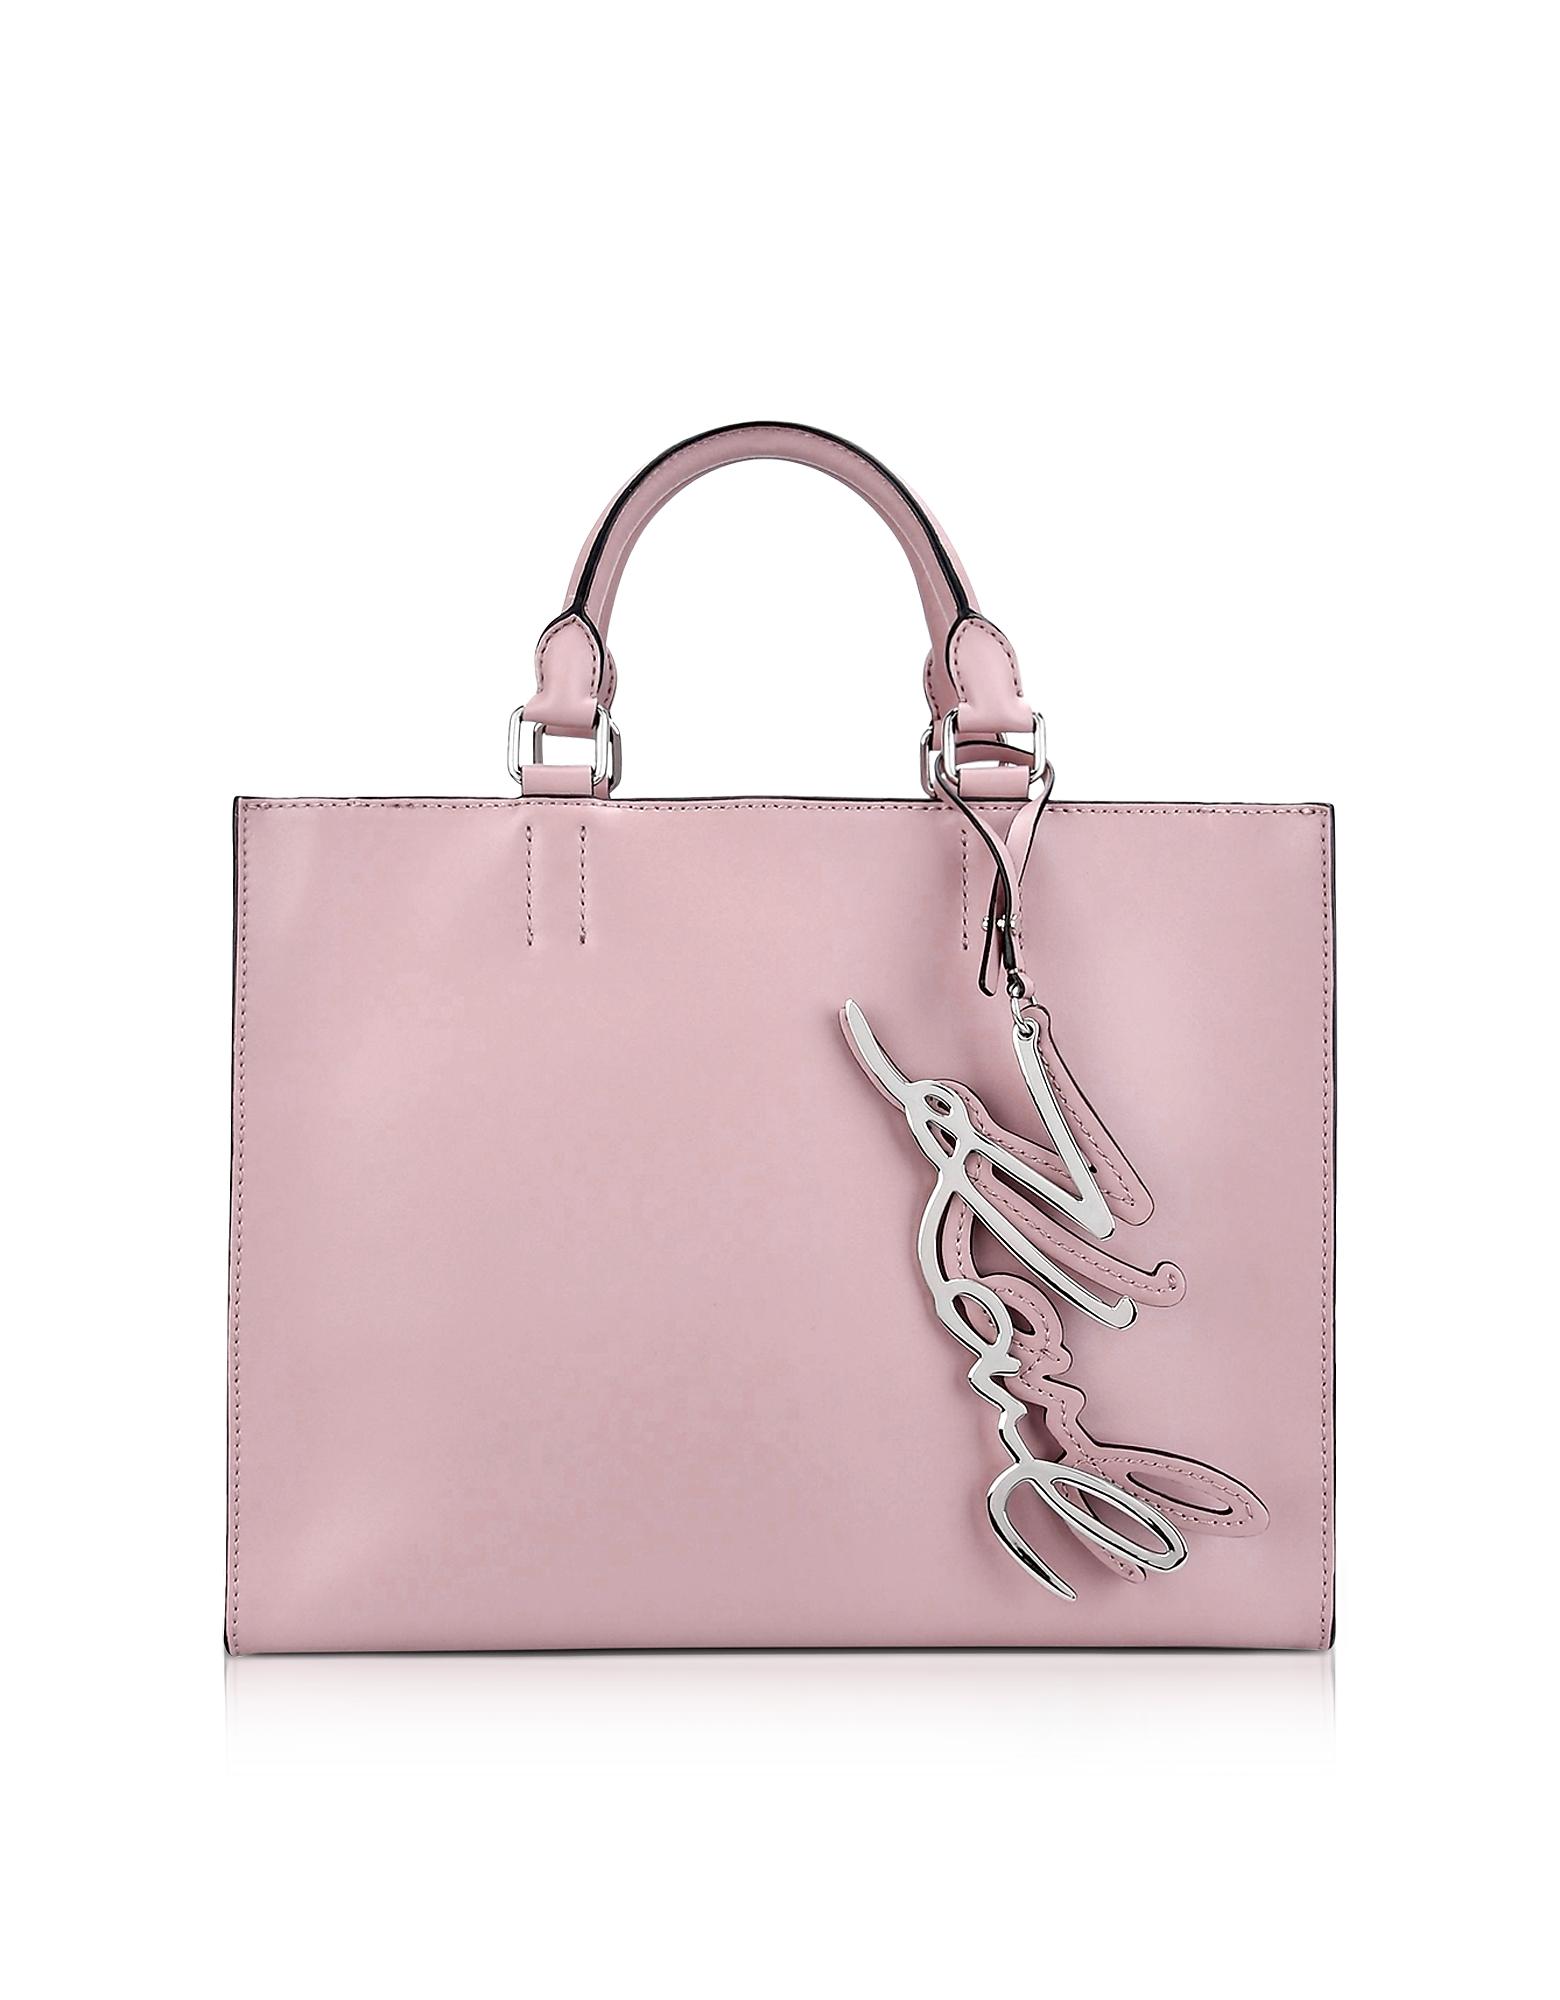 Karl Lagerfeld Handbags, K/Metal Signature Pink Ballet Leather Shopper Bag